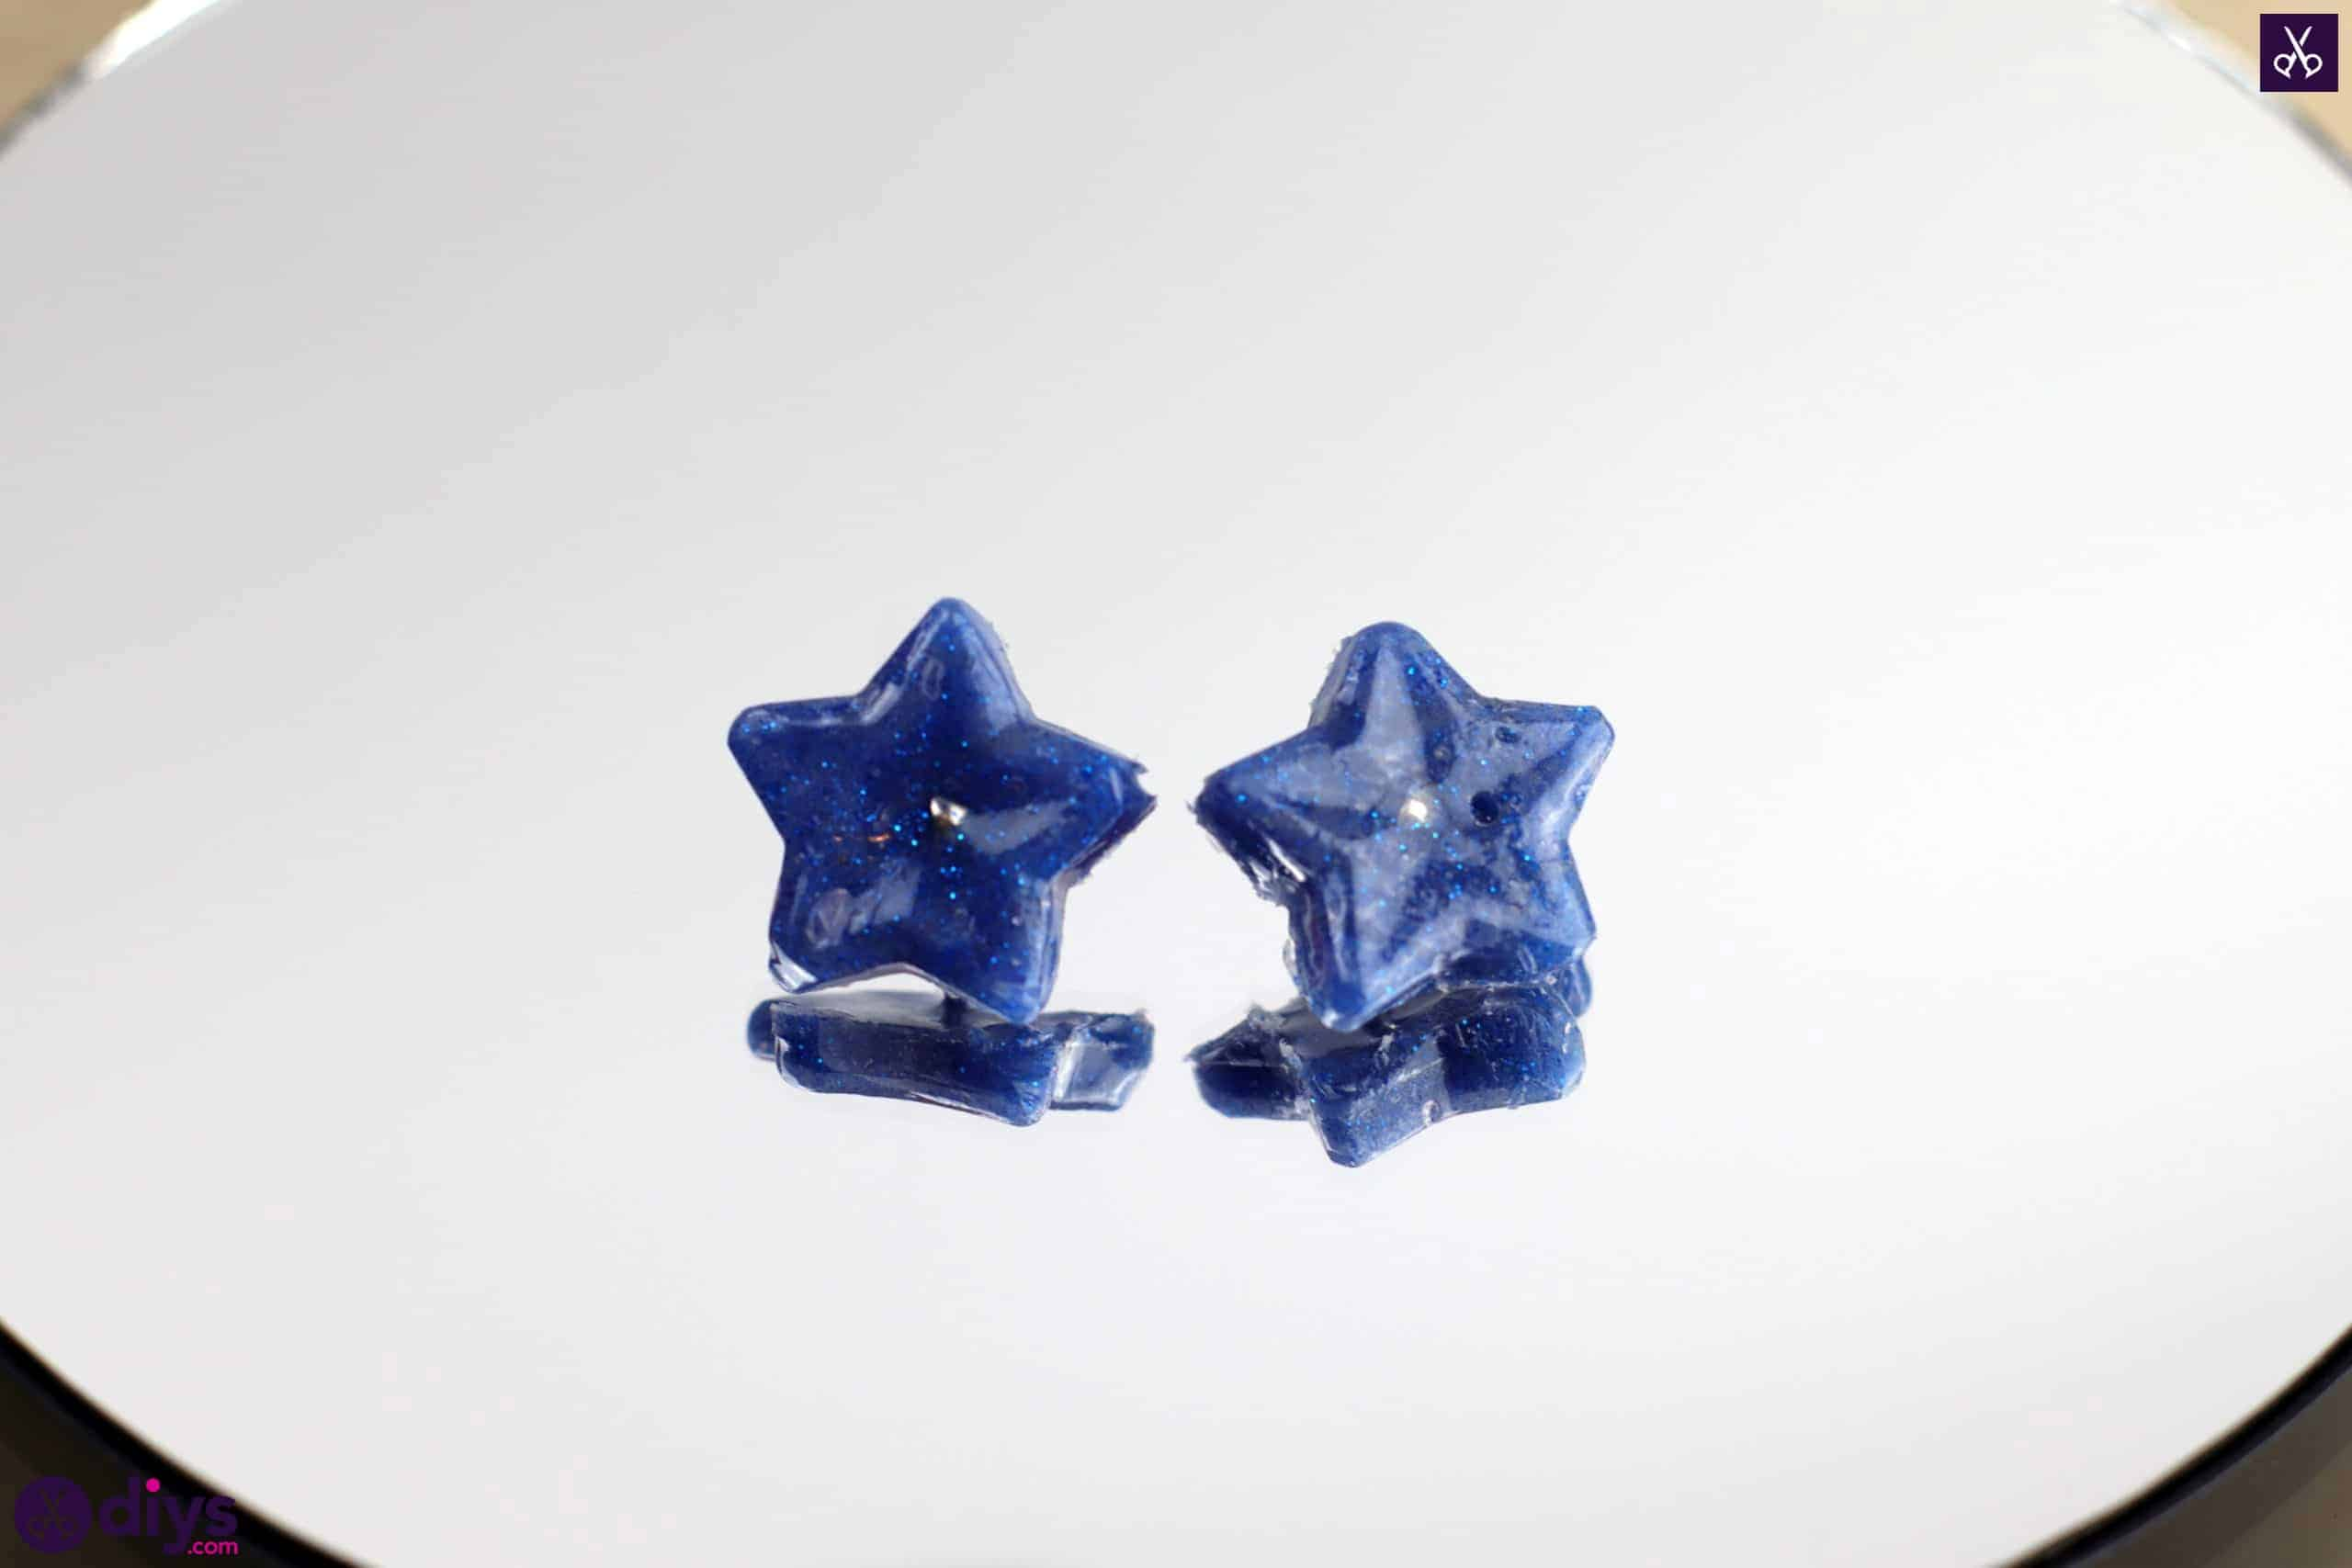 Diy hot glue star earrings simple project